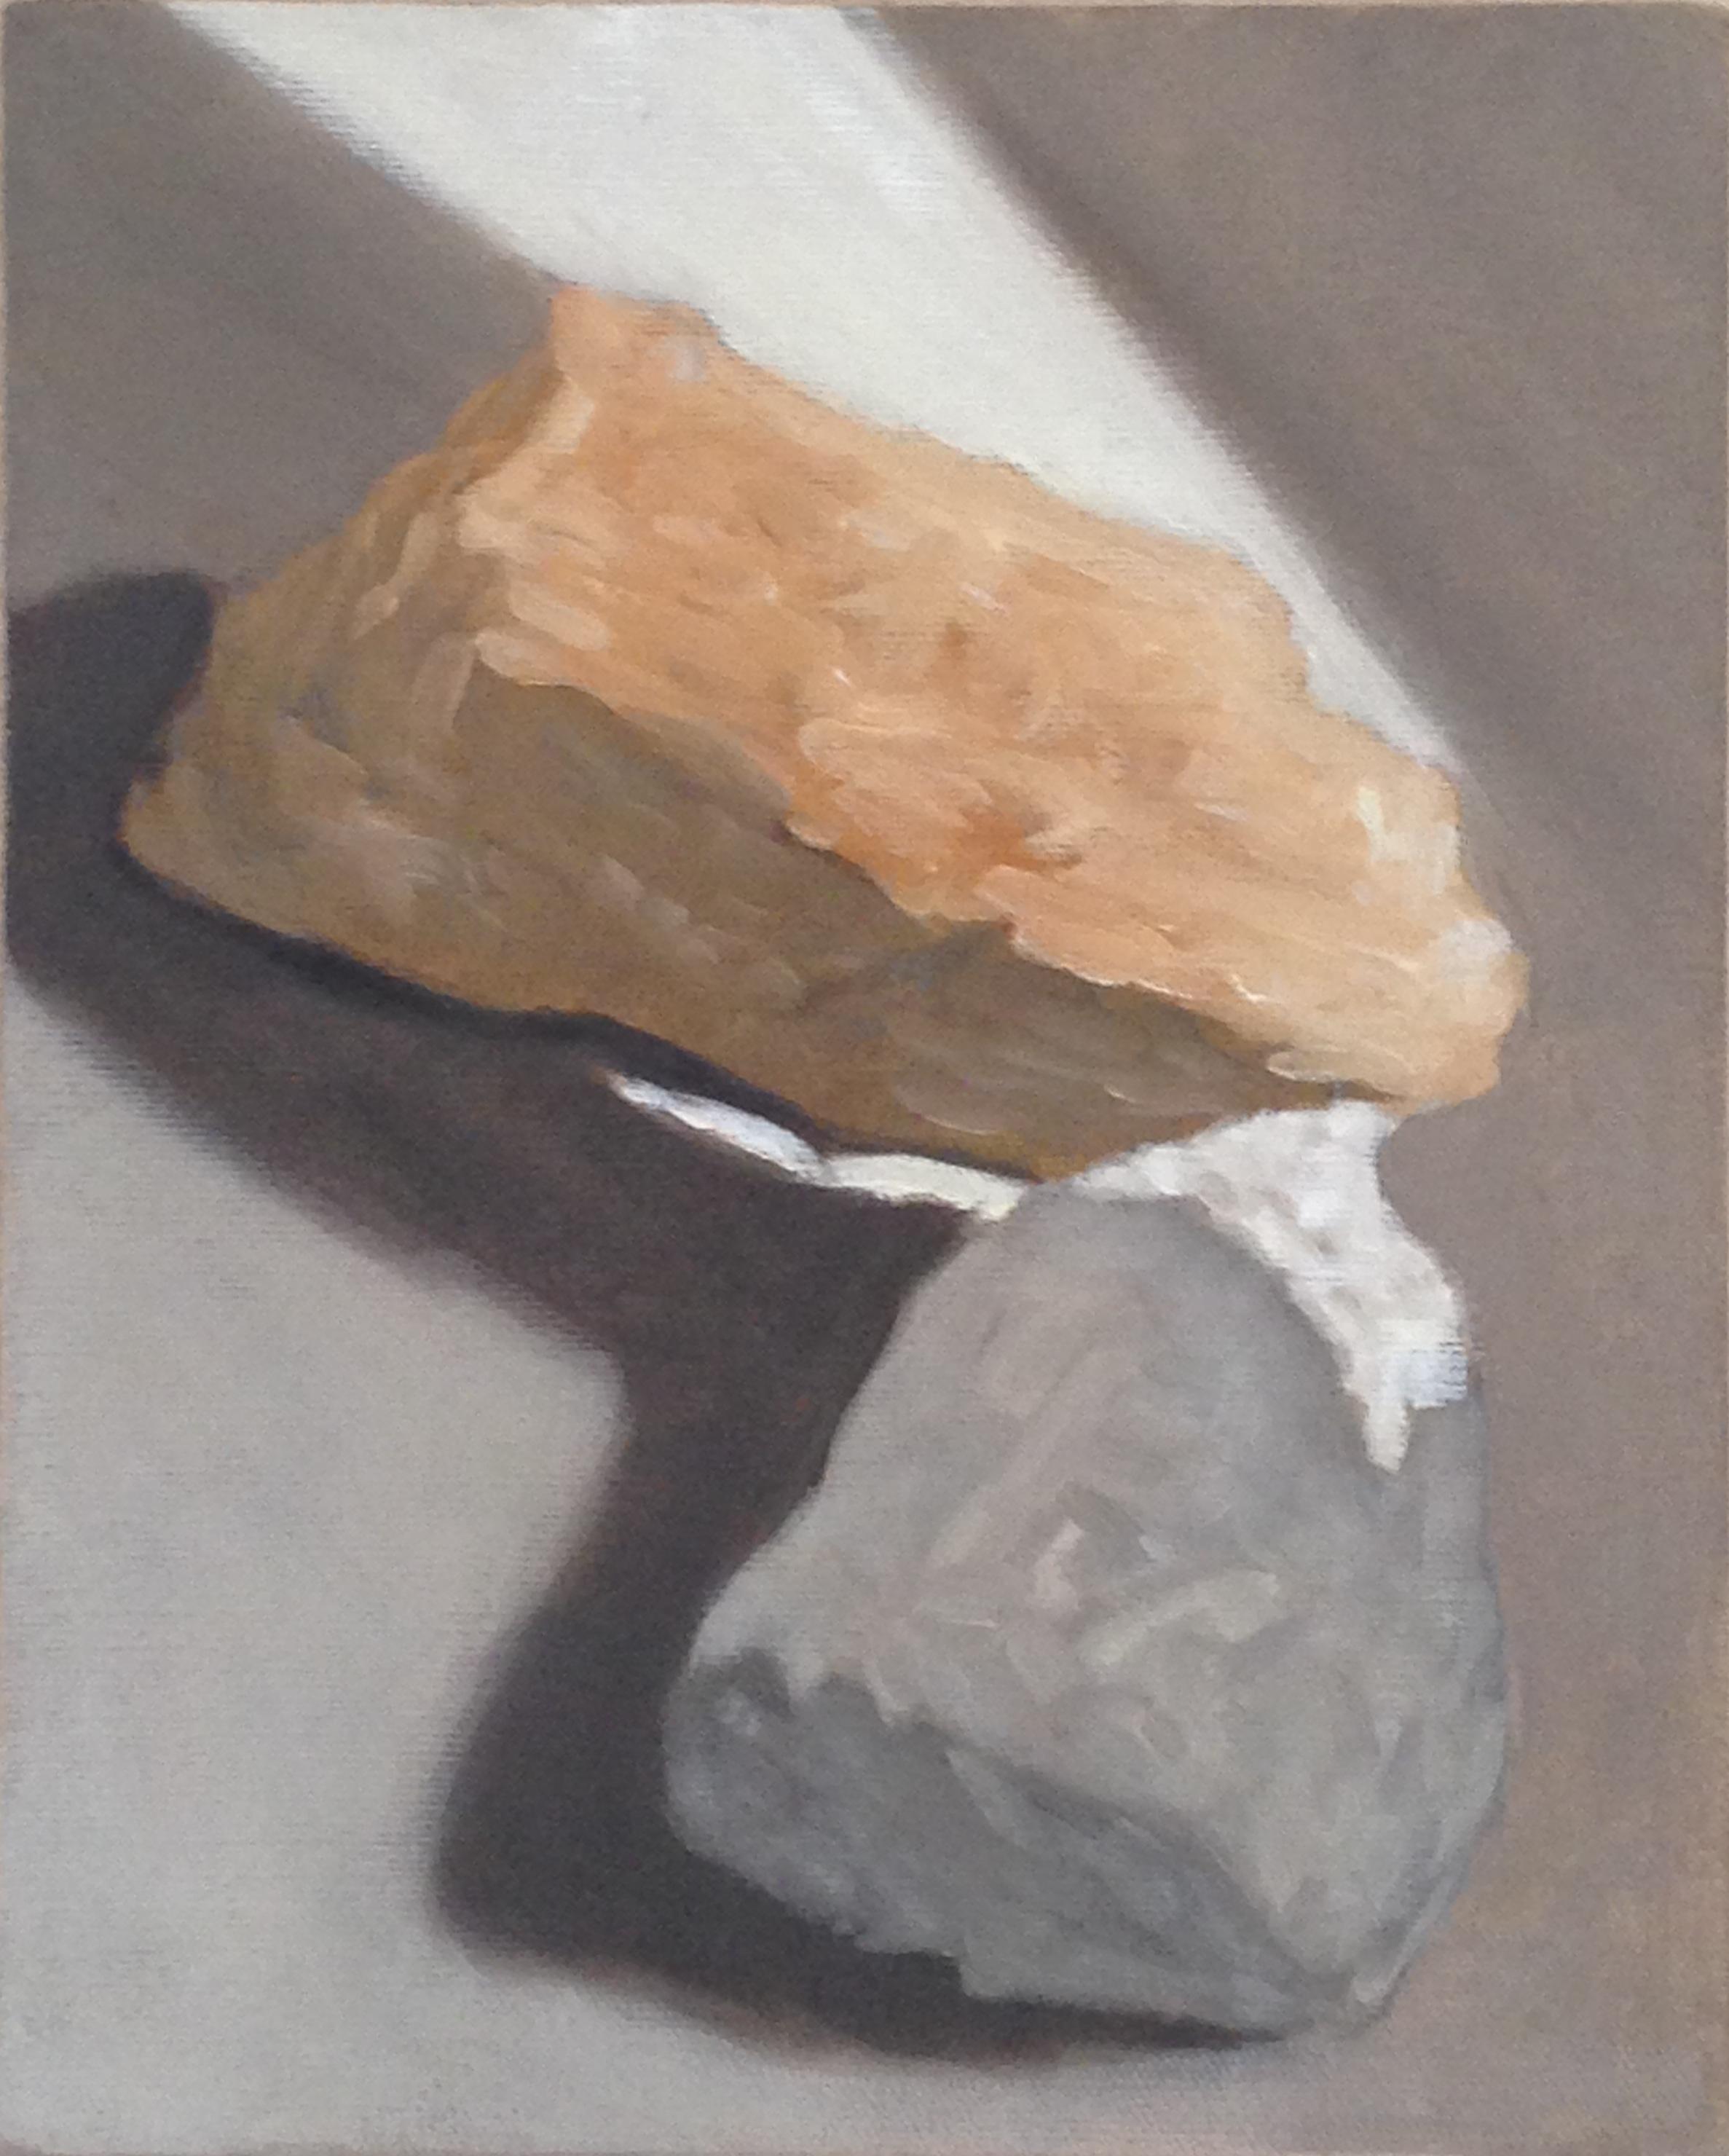 A 15) Pietre, olio su tela, 2017